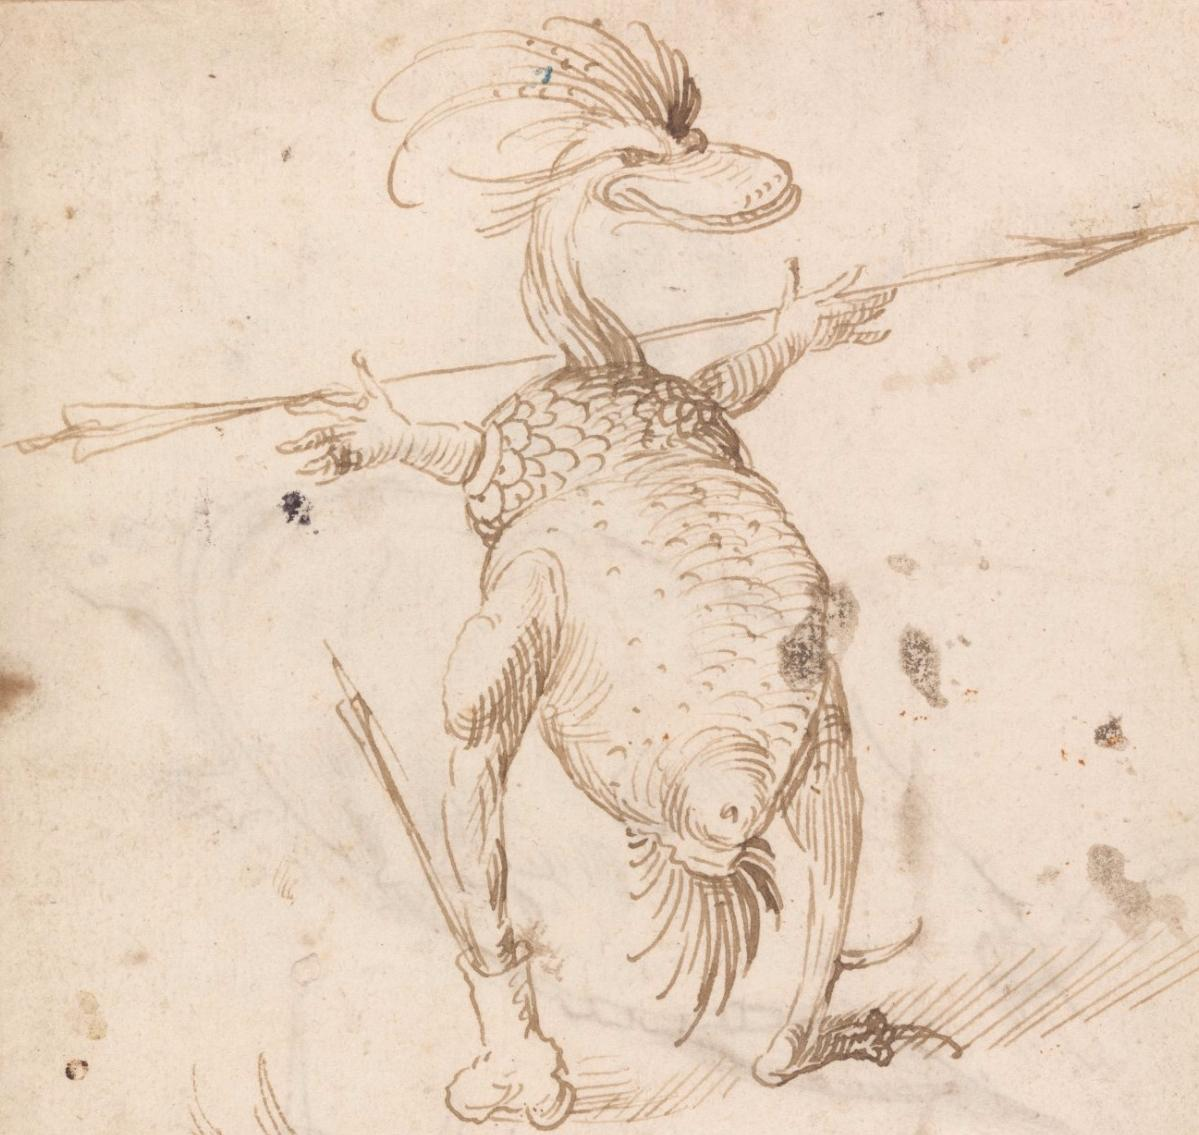 Detail of Two Monsters, Pen and brown ink on paper, Kupferstichkabinett, Staatliche Museen zu Berlin